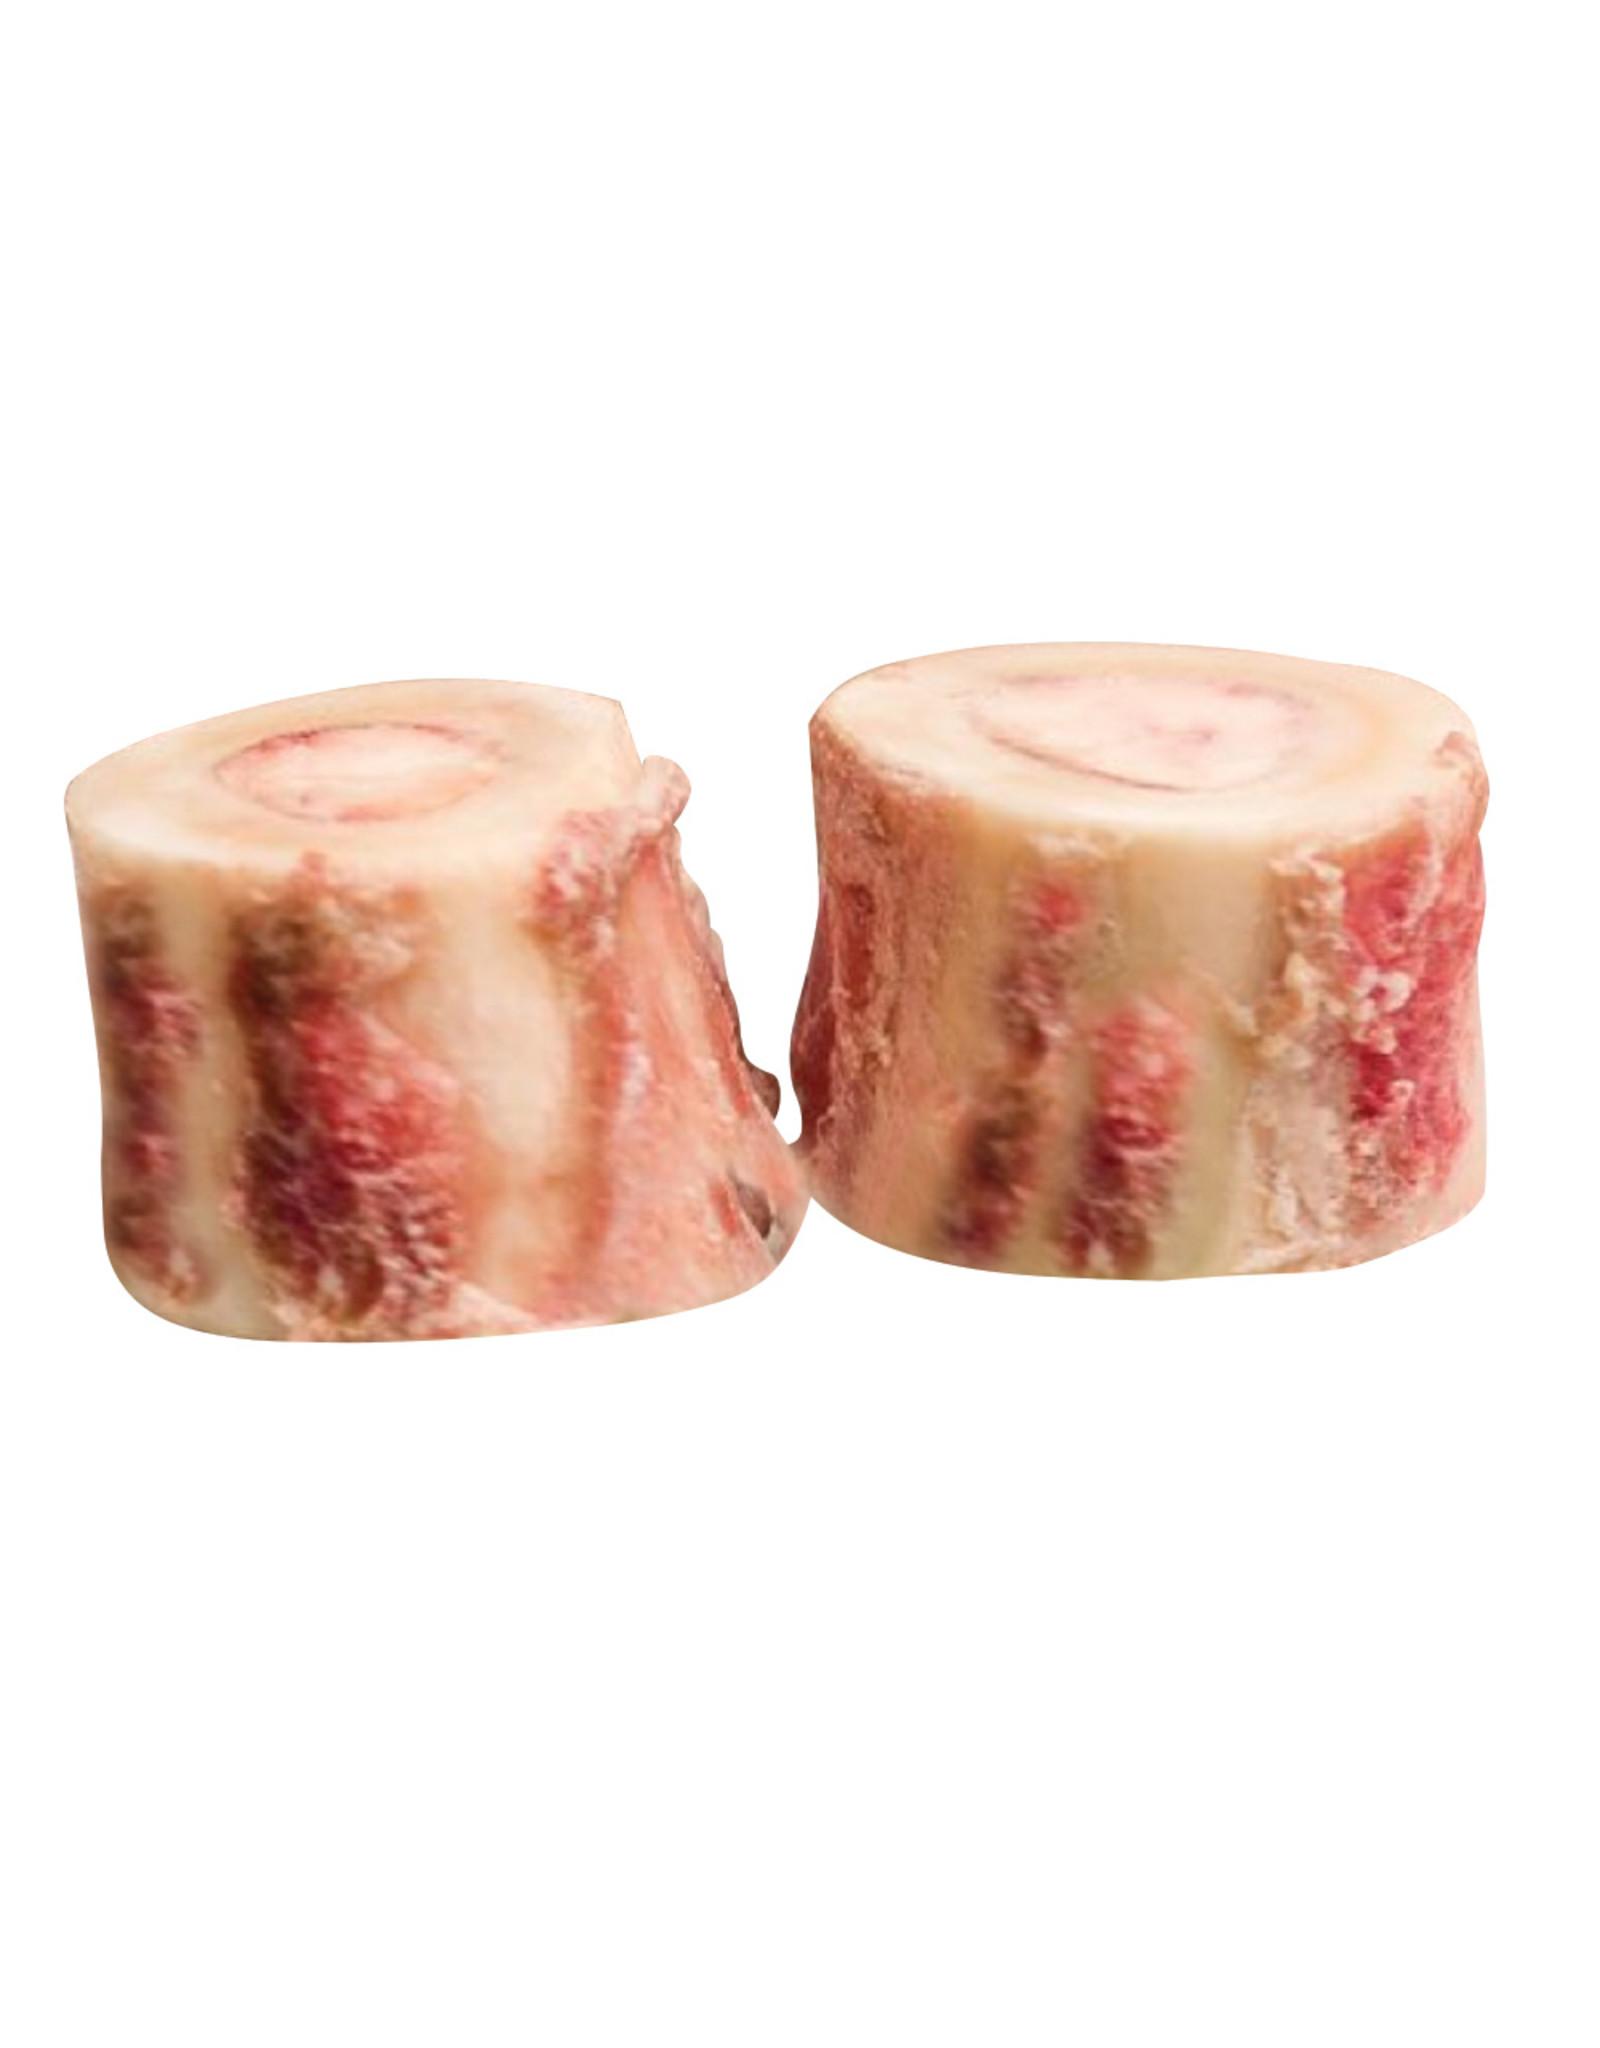 Big Country Raw Beef Marrow Bone Small 2lb Bag